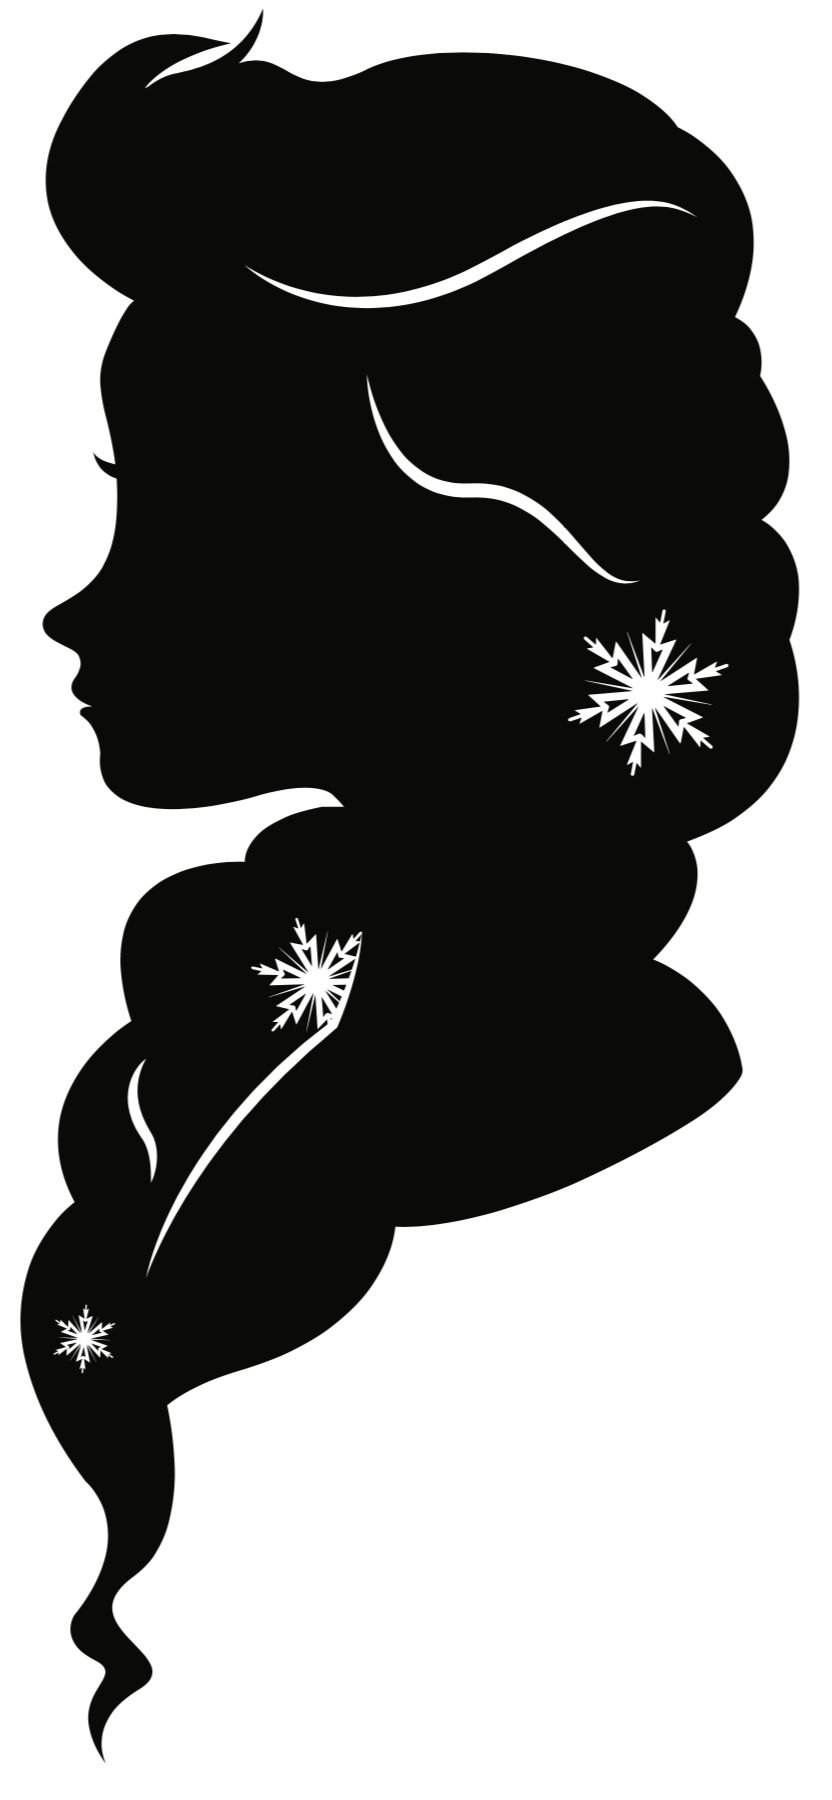 Elsa Frozen Disney High Definition Silhouettes Miss Mandee Disney Silhouette Art Disney Princess Silhouette Disney Silhouettes